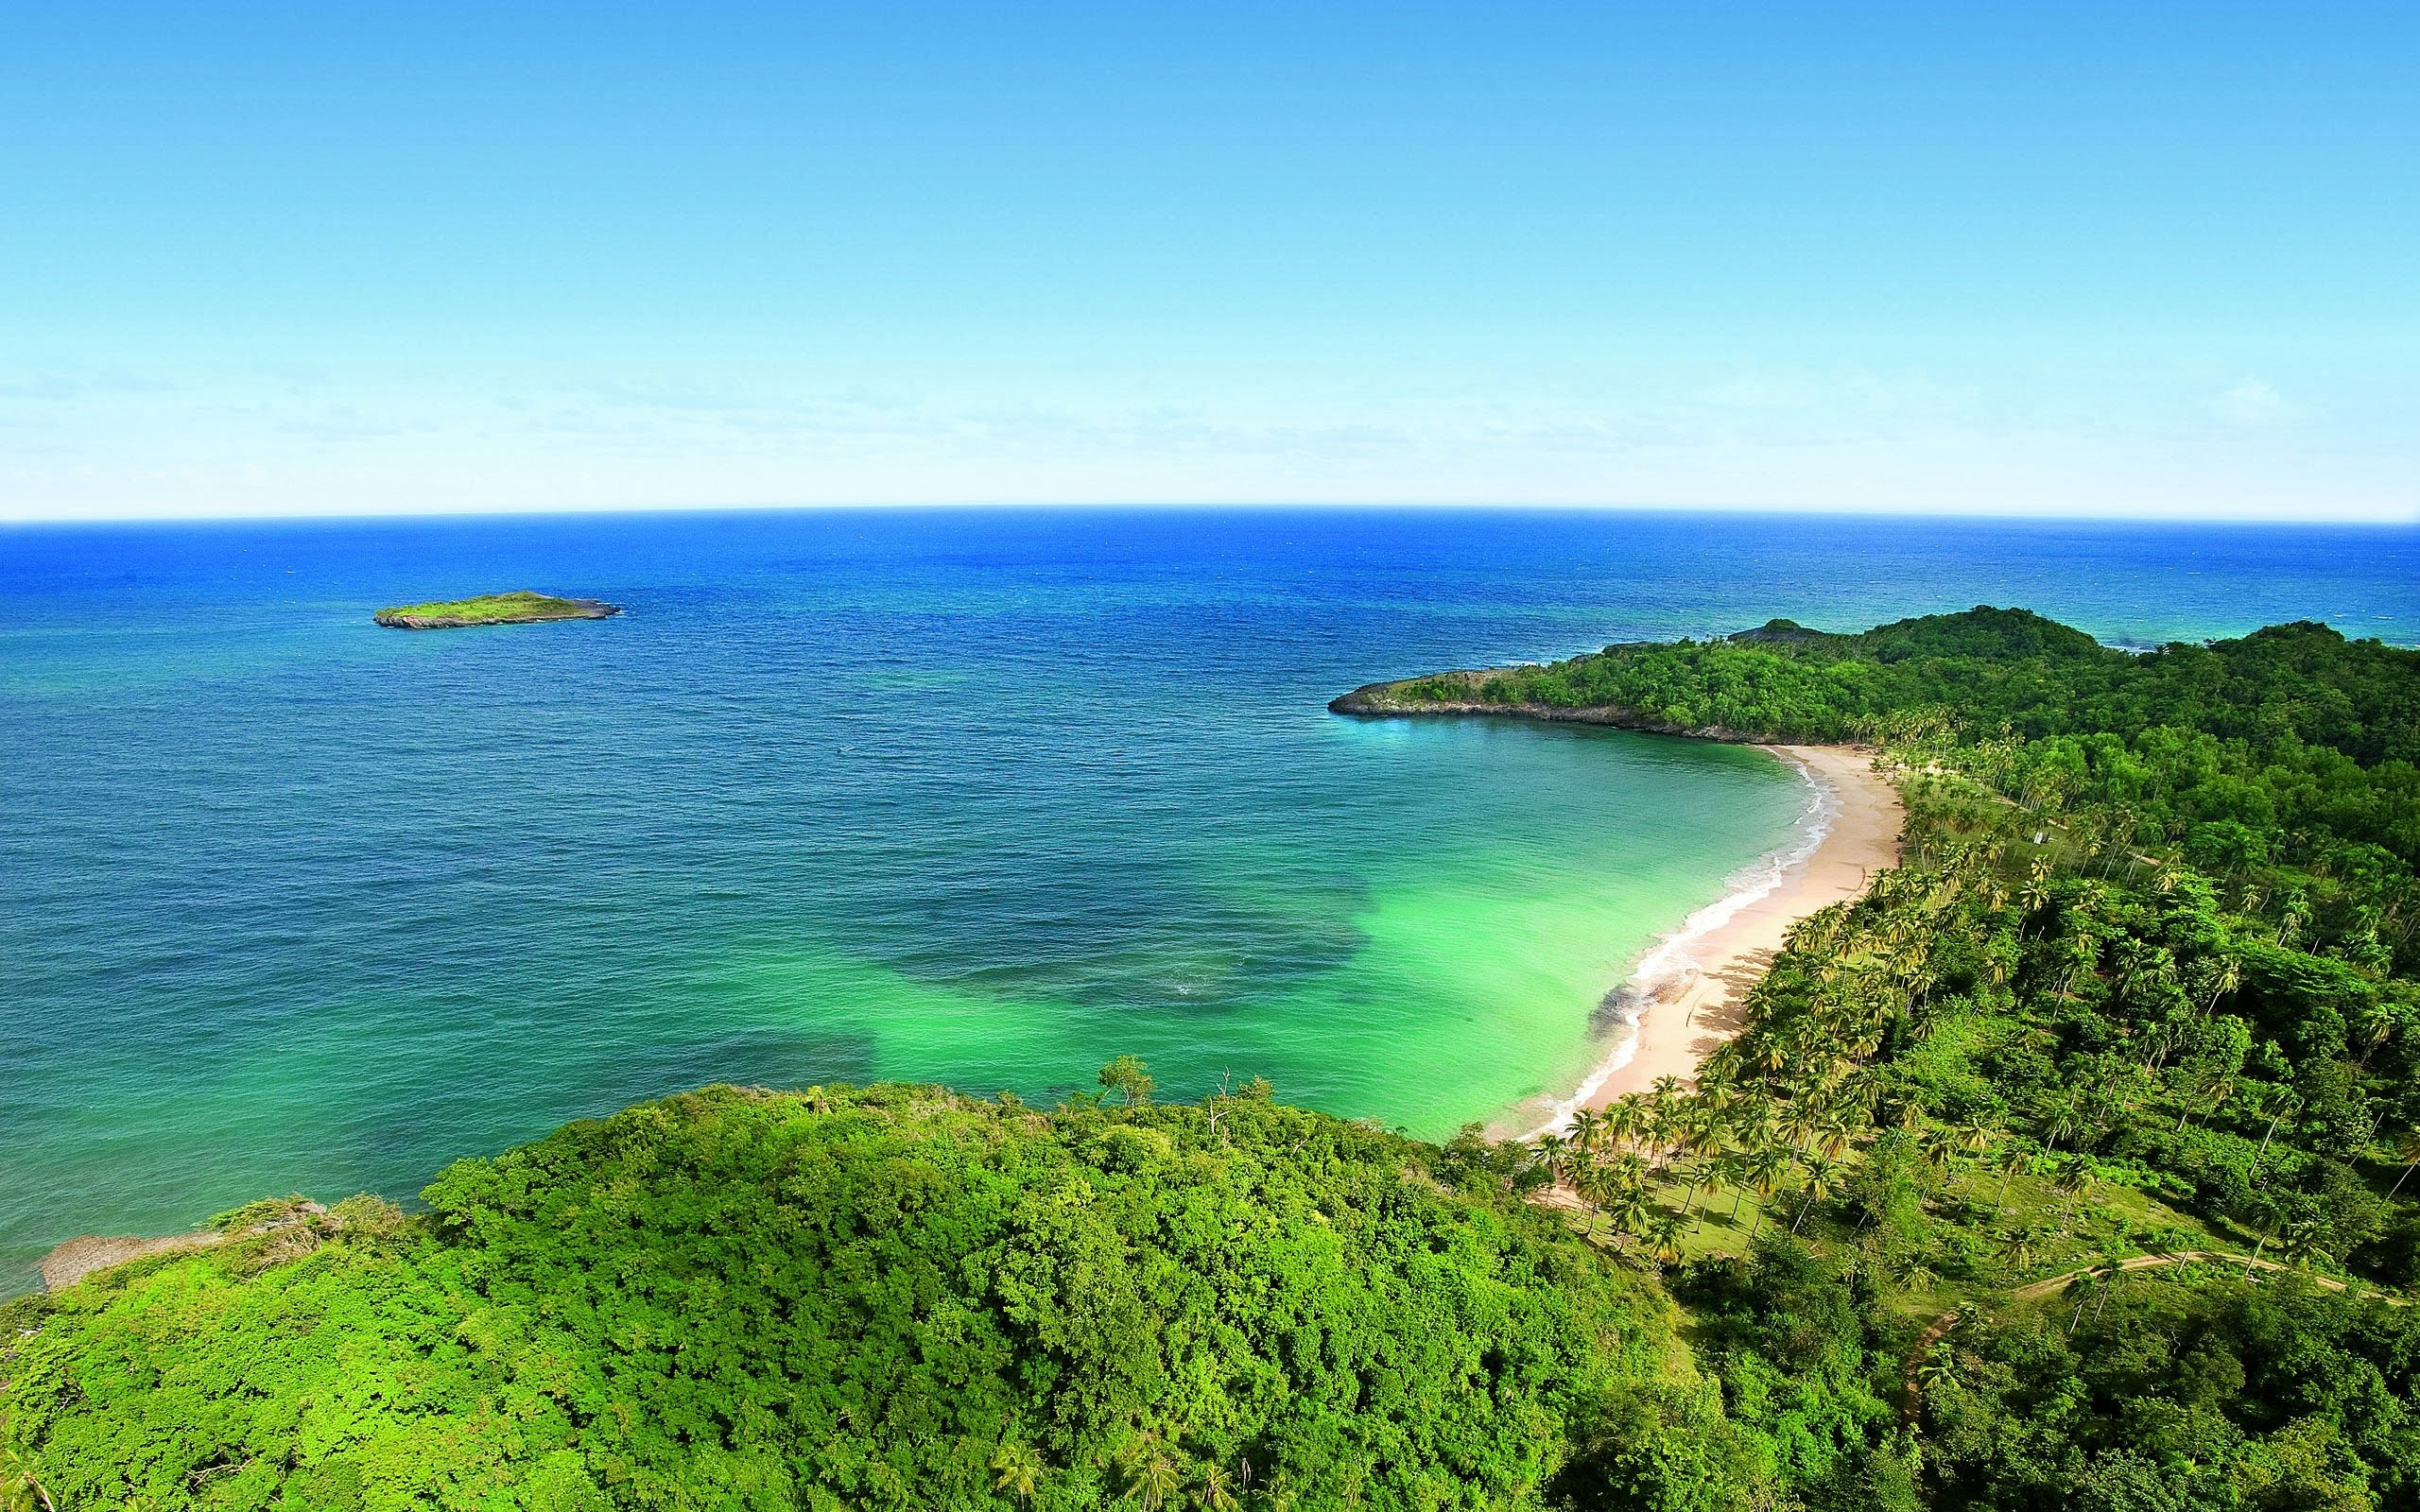 Beautiful shore photo